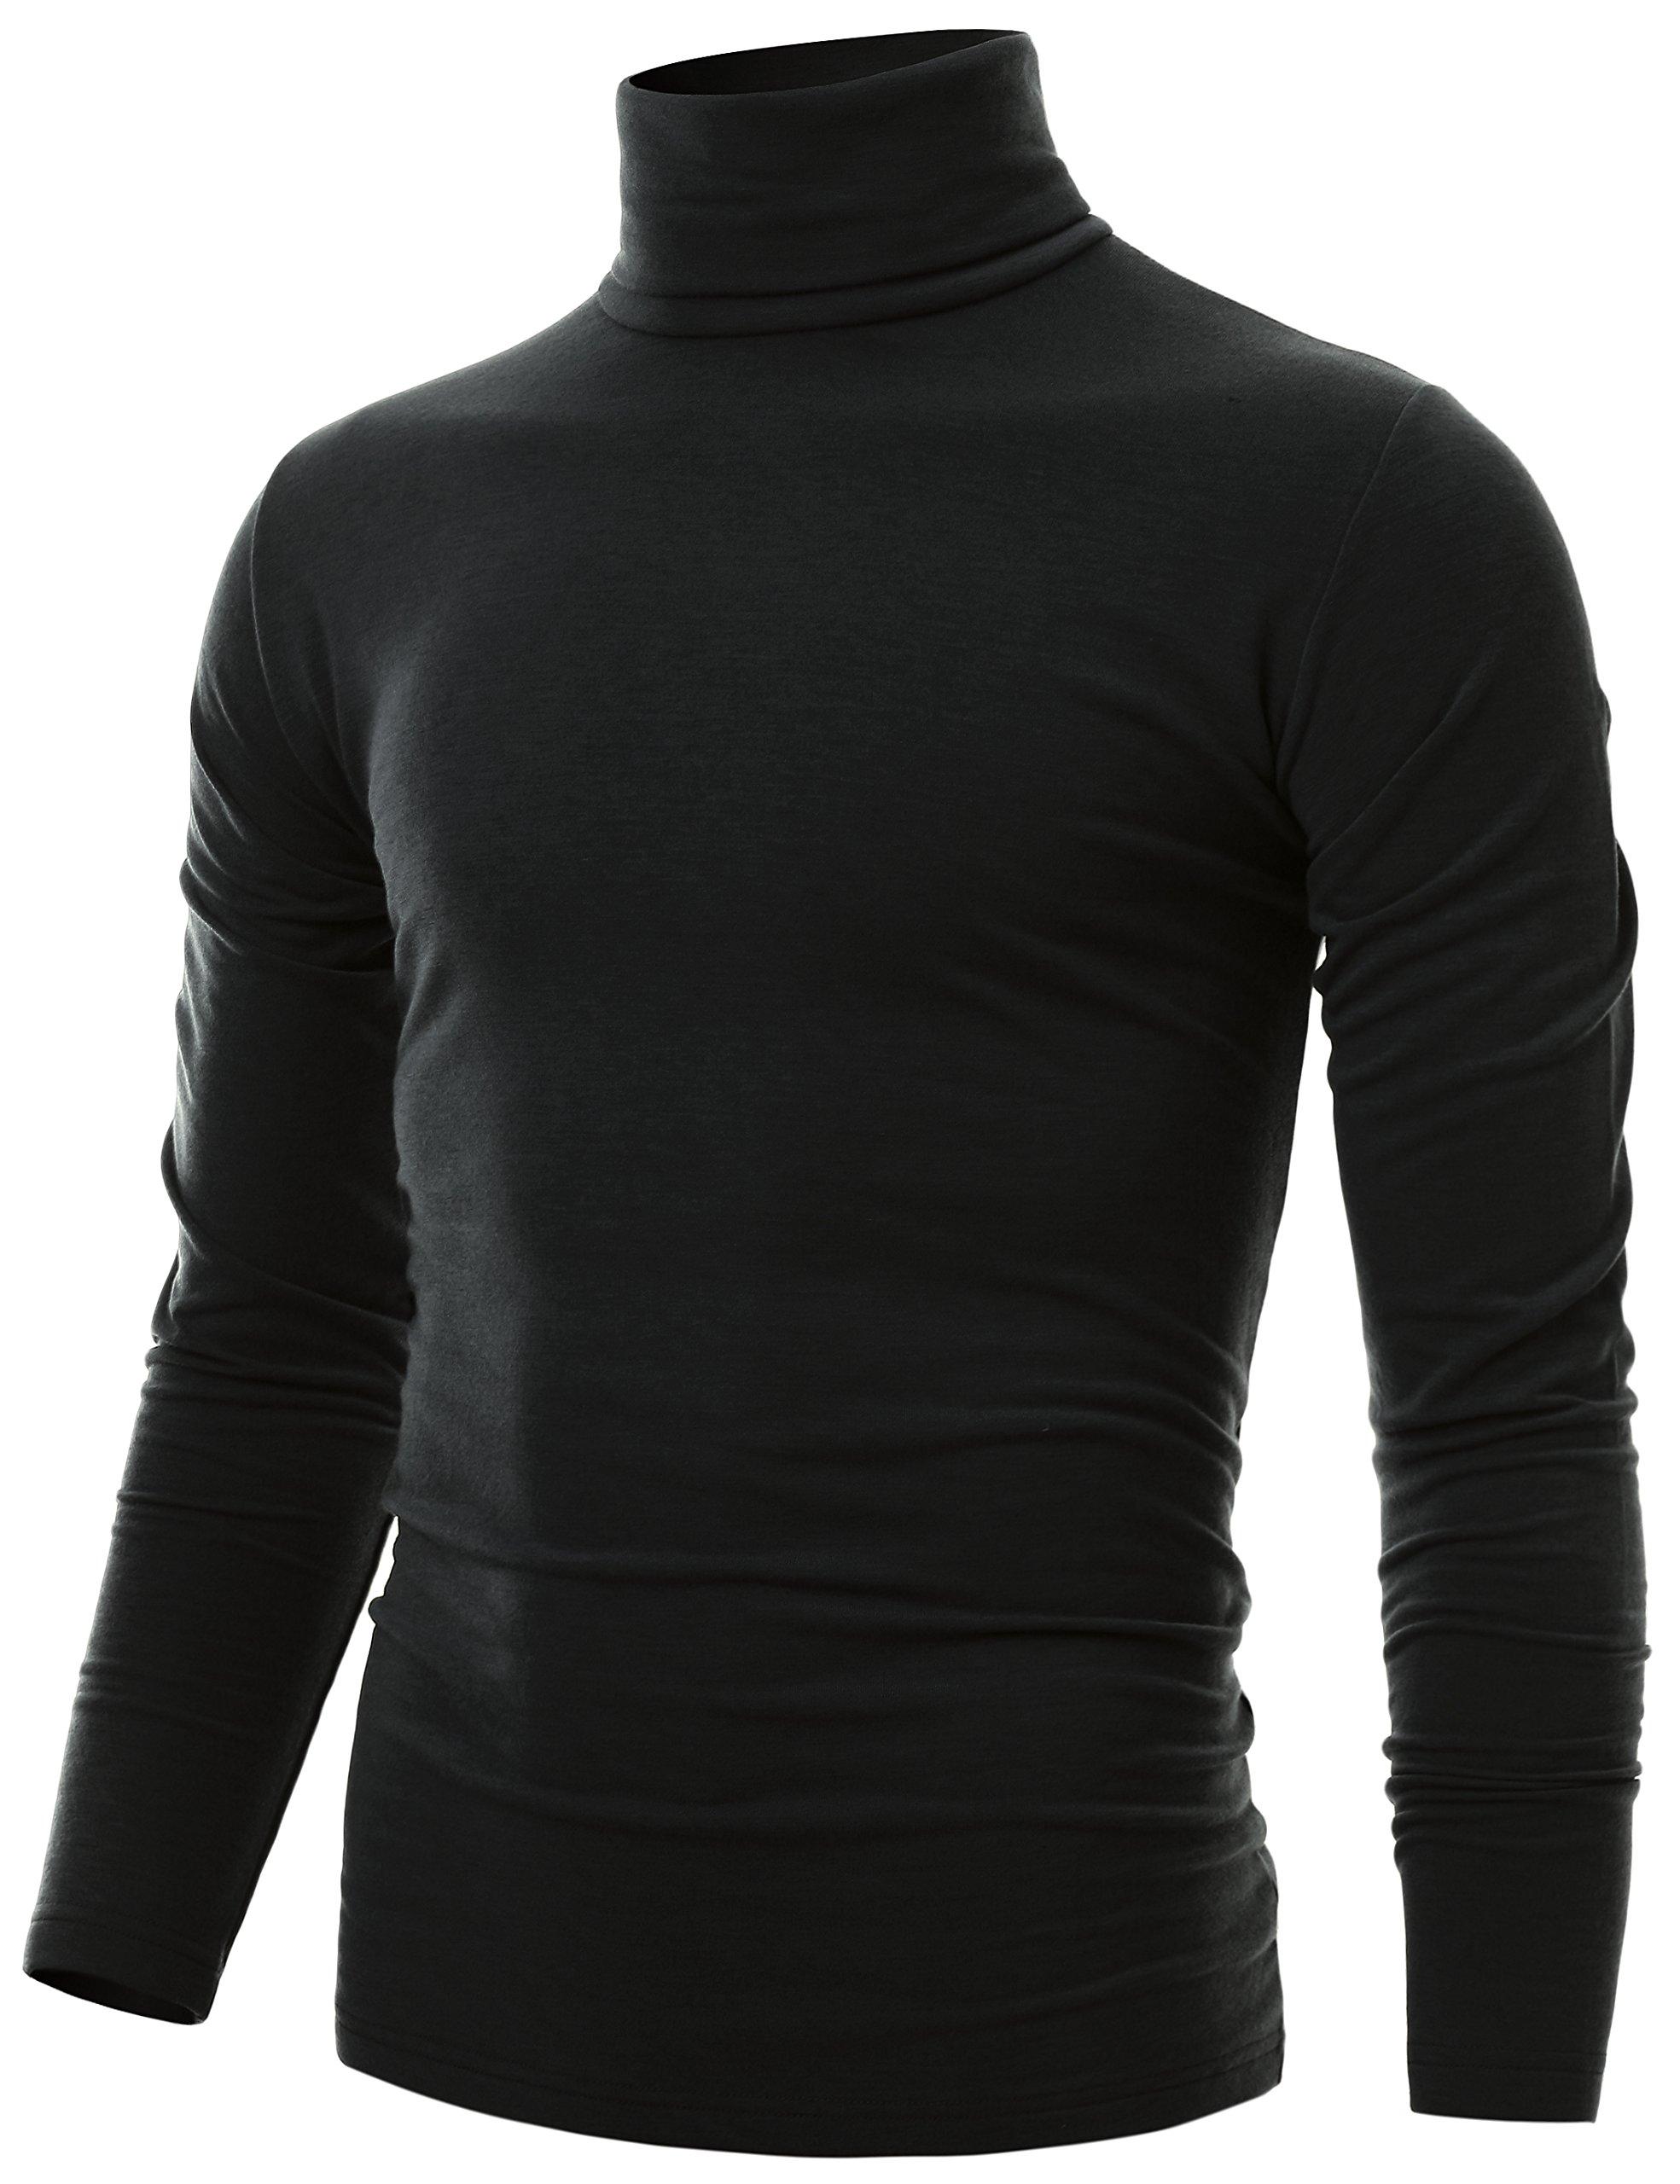 Ohoo Mens Slim Fit Soft Cotton Long Sleeve Pullover Lightweight Turtleneck/DCT001-BLACK-XL